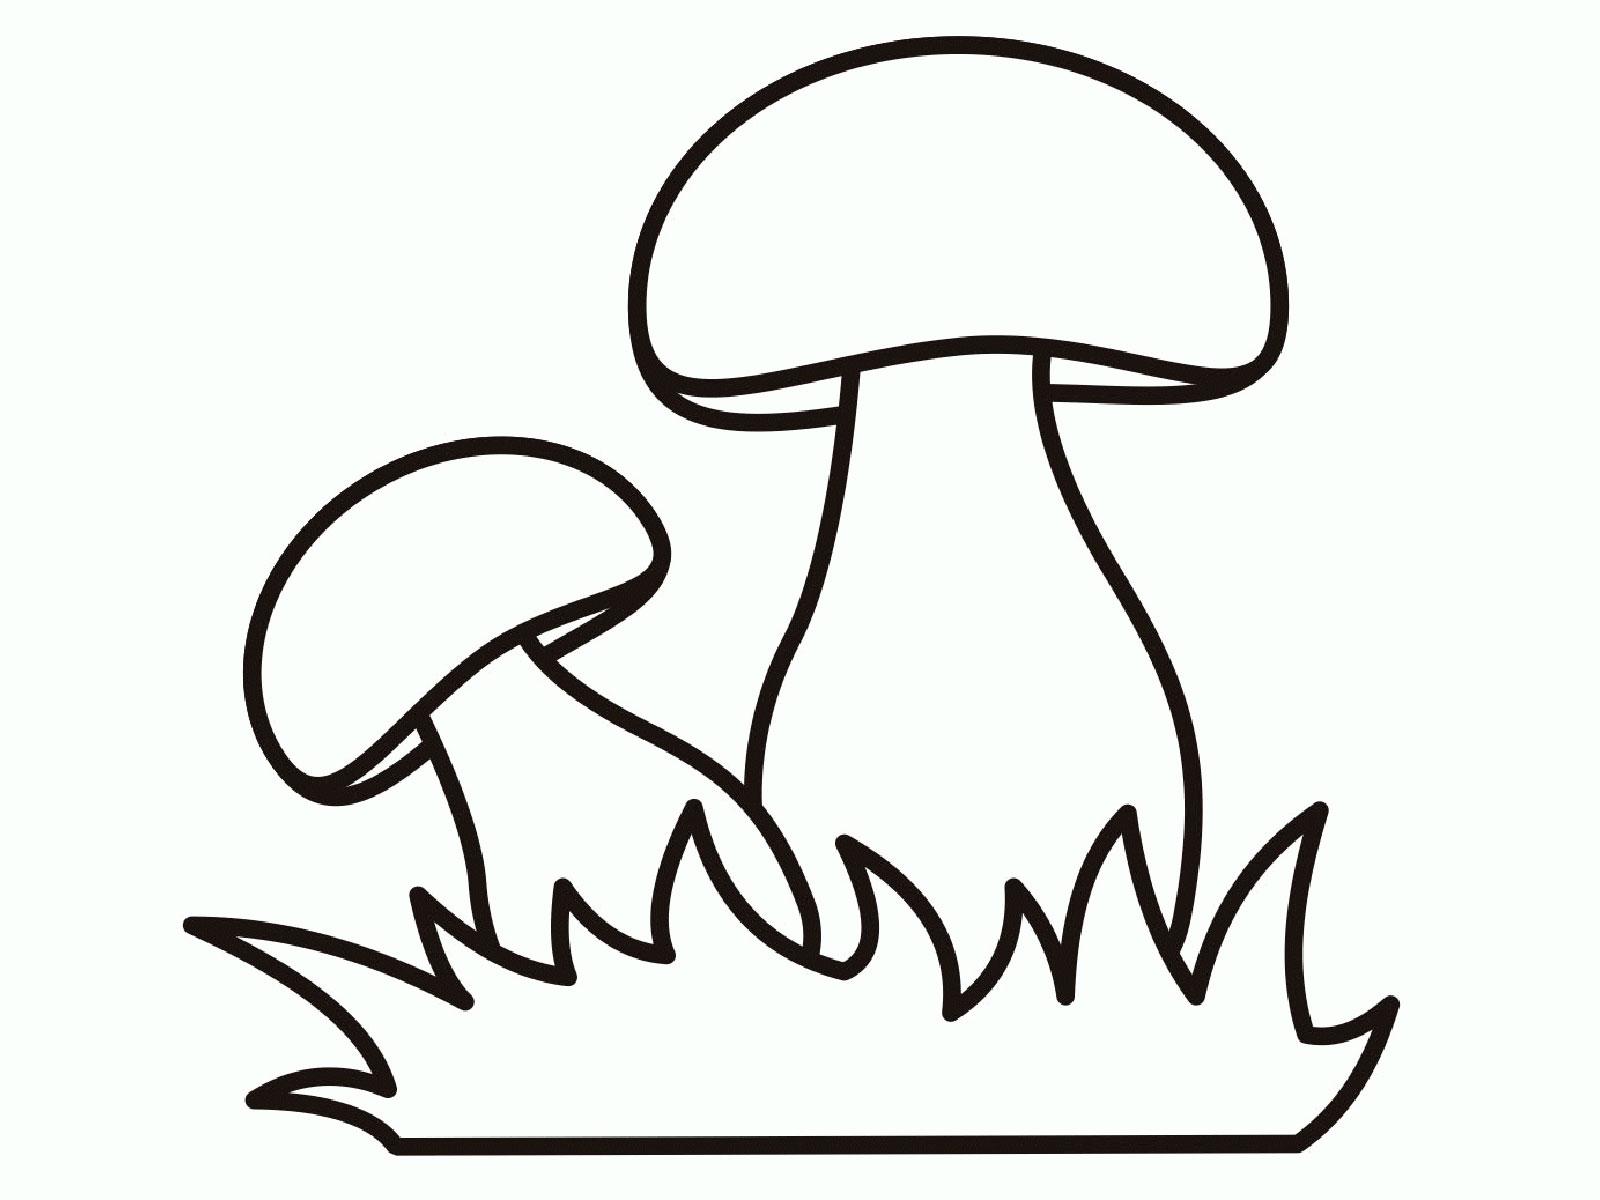 грибы раскраска картинка